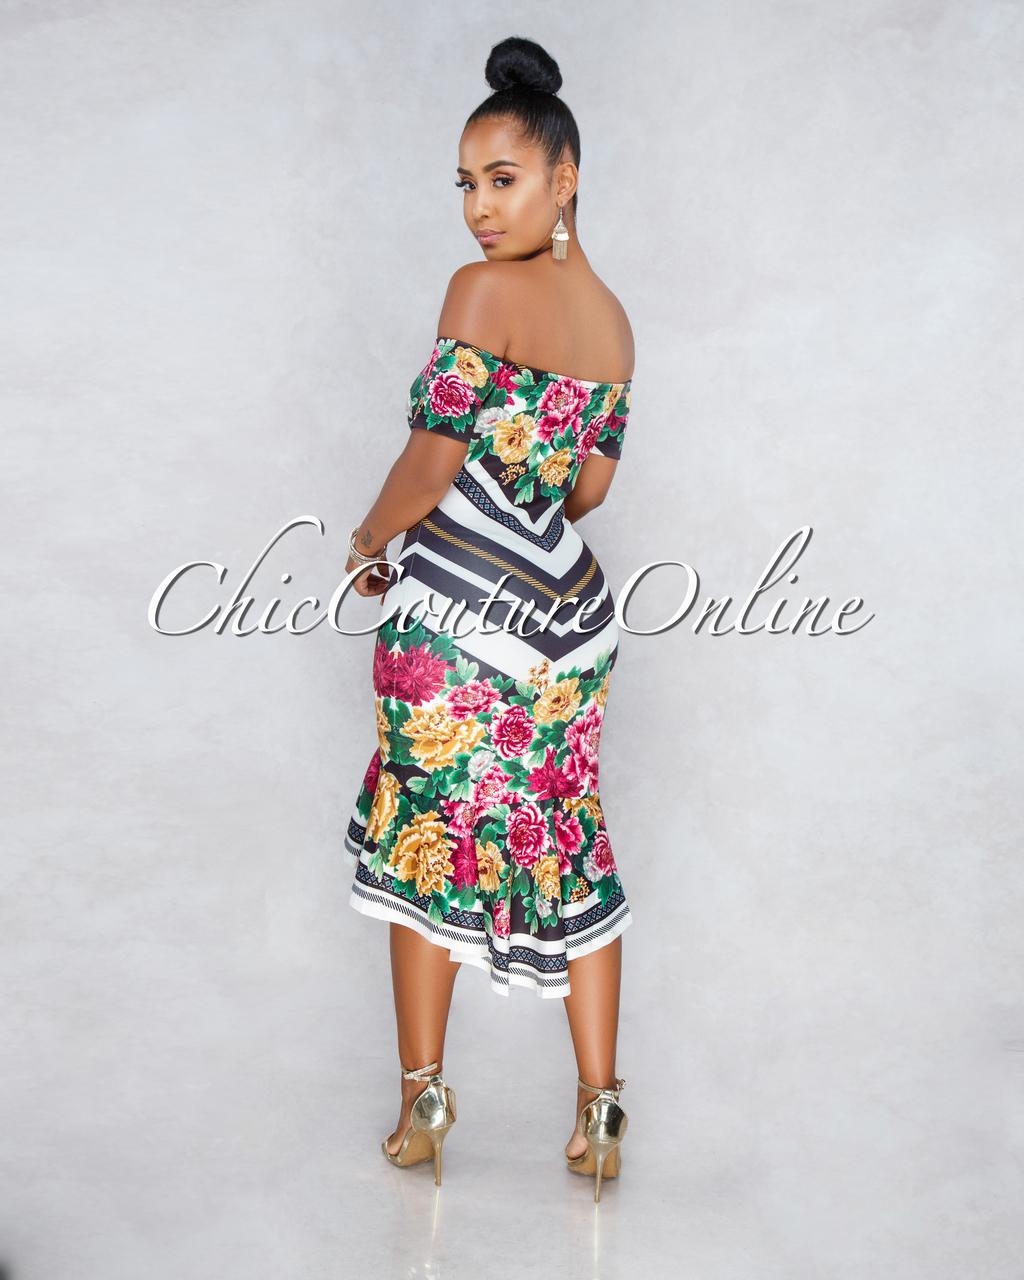 Demi Off-White Black Stripes Floral Print High-Low Dress